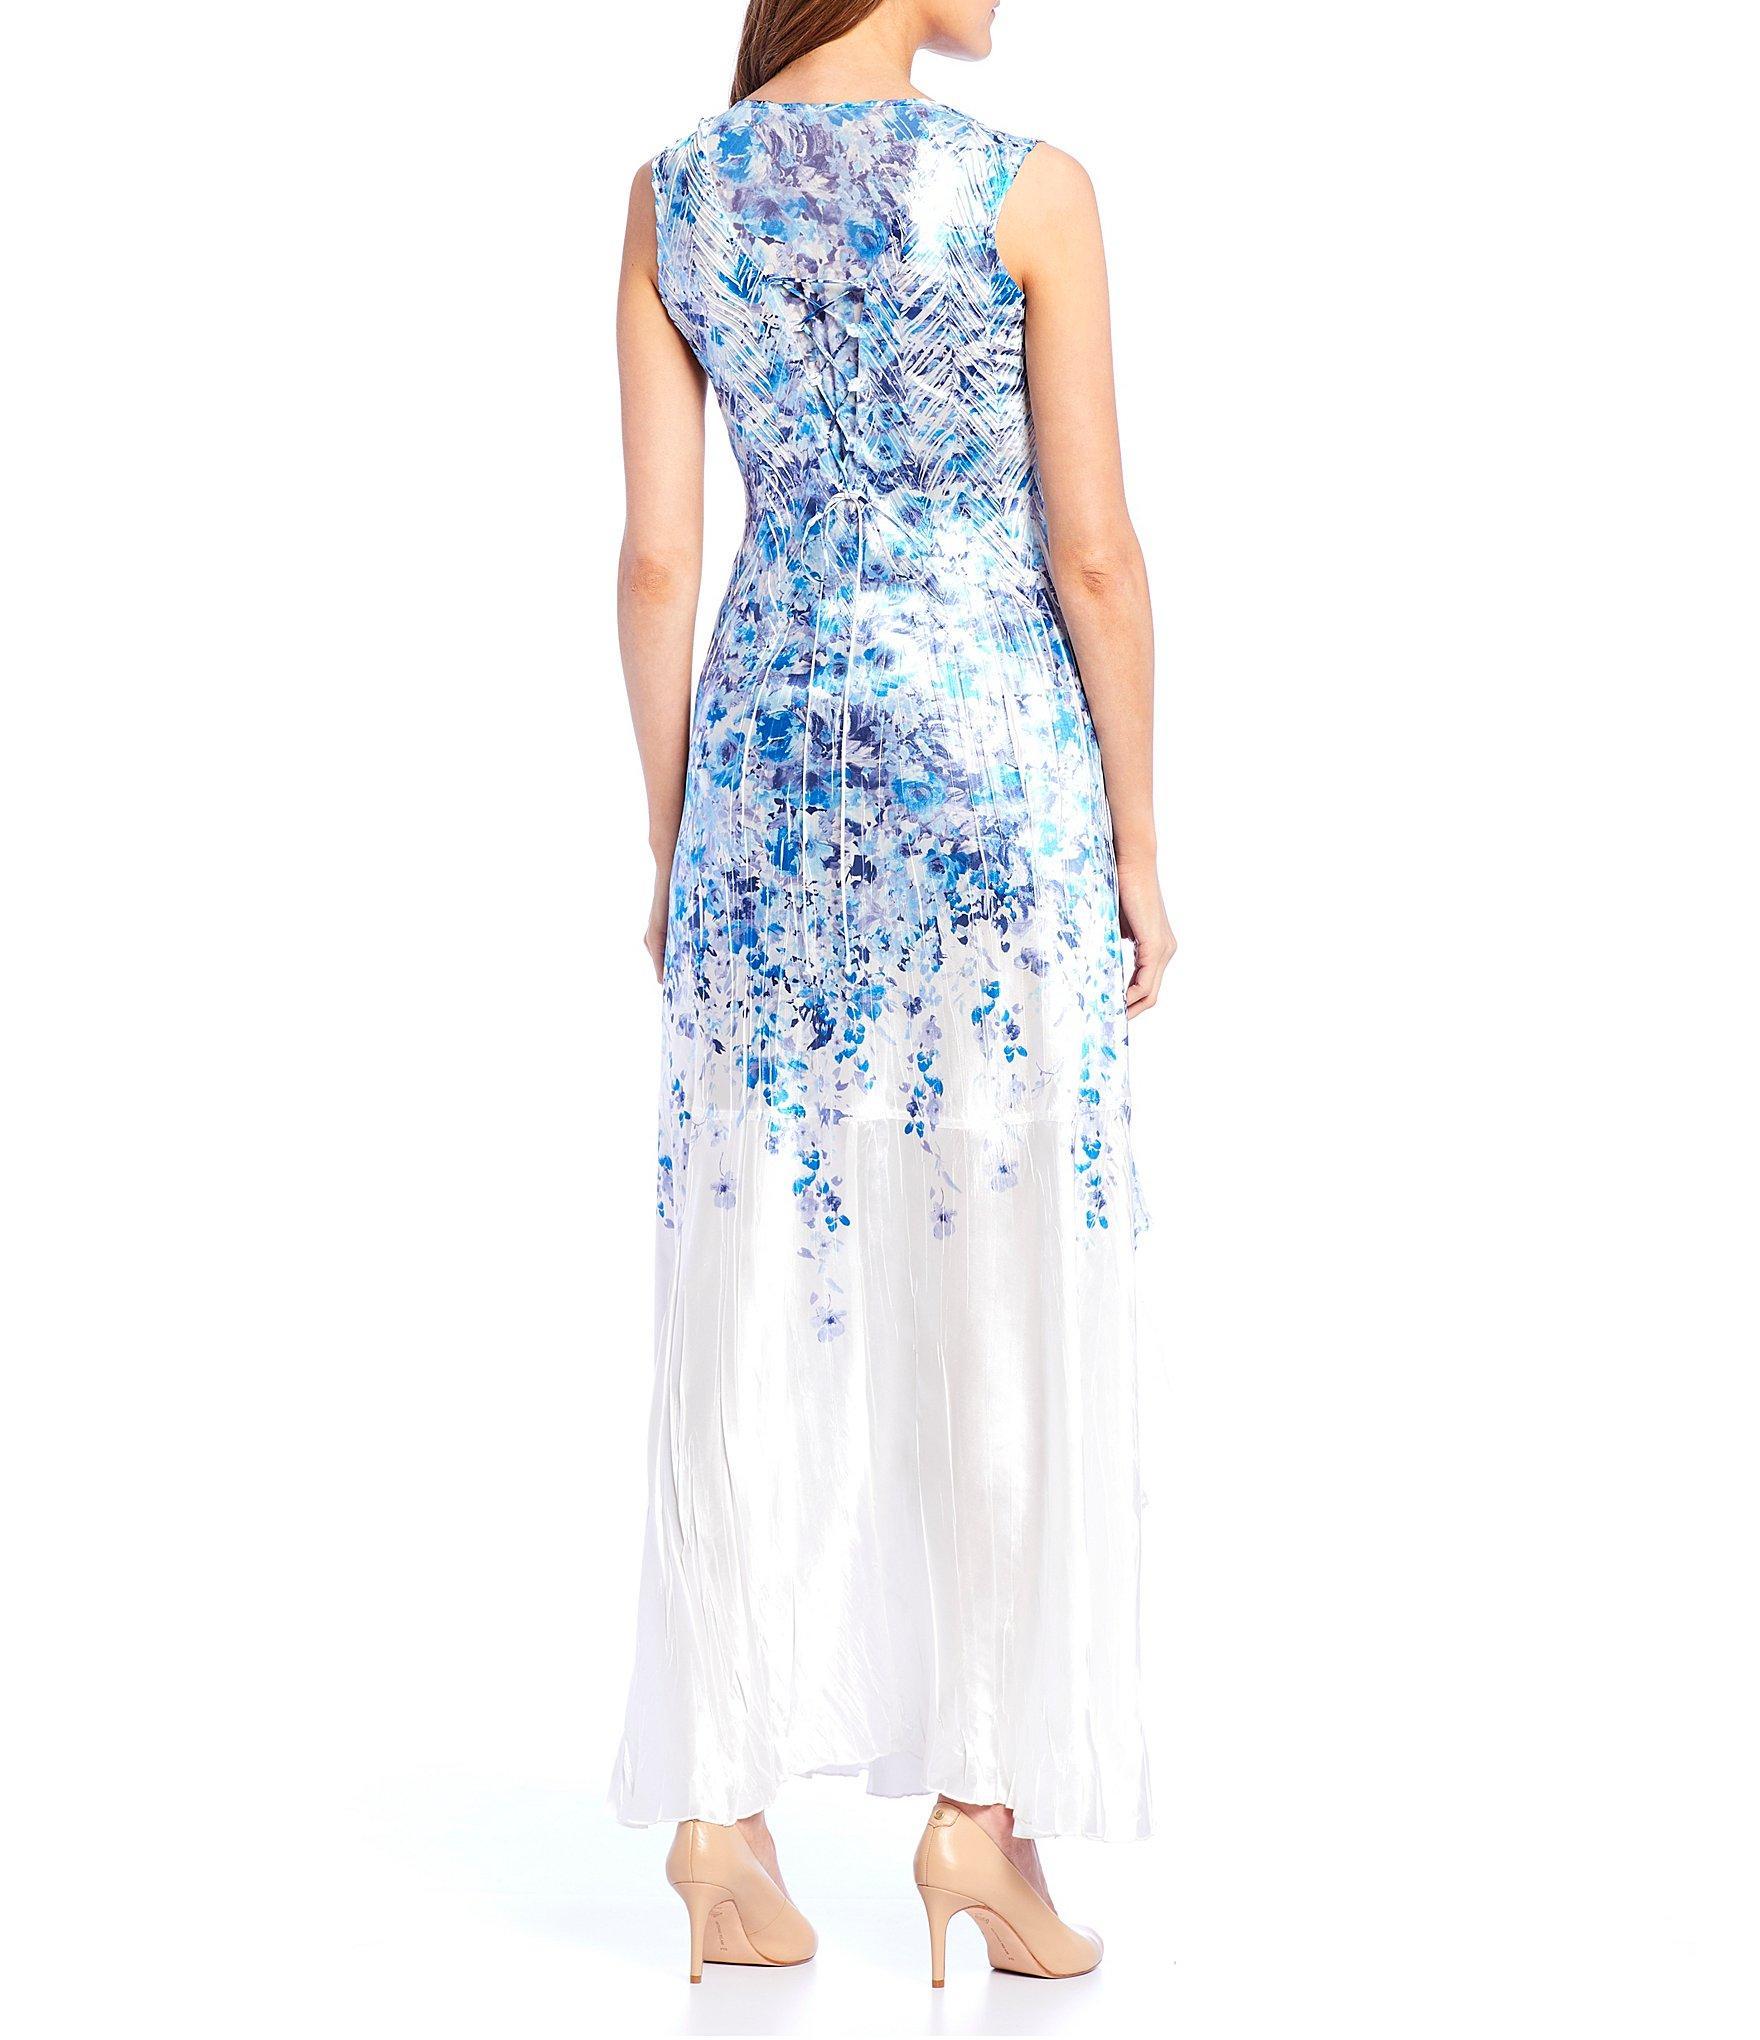 fac7d66b8eb Lyst - Komarov V-neck Floral Sleeveless Dress in Blue